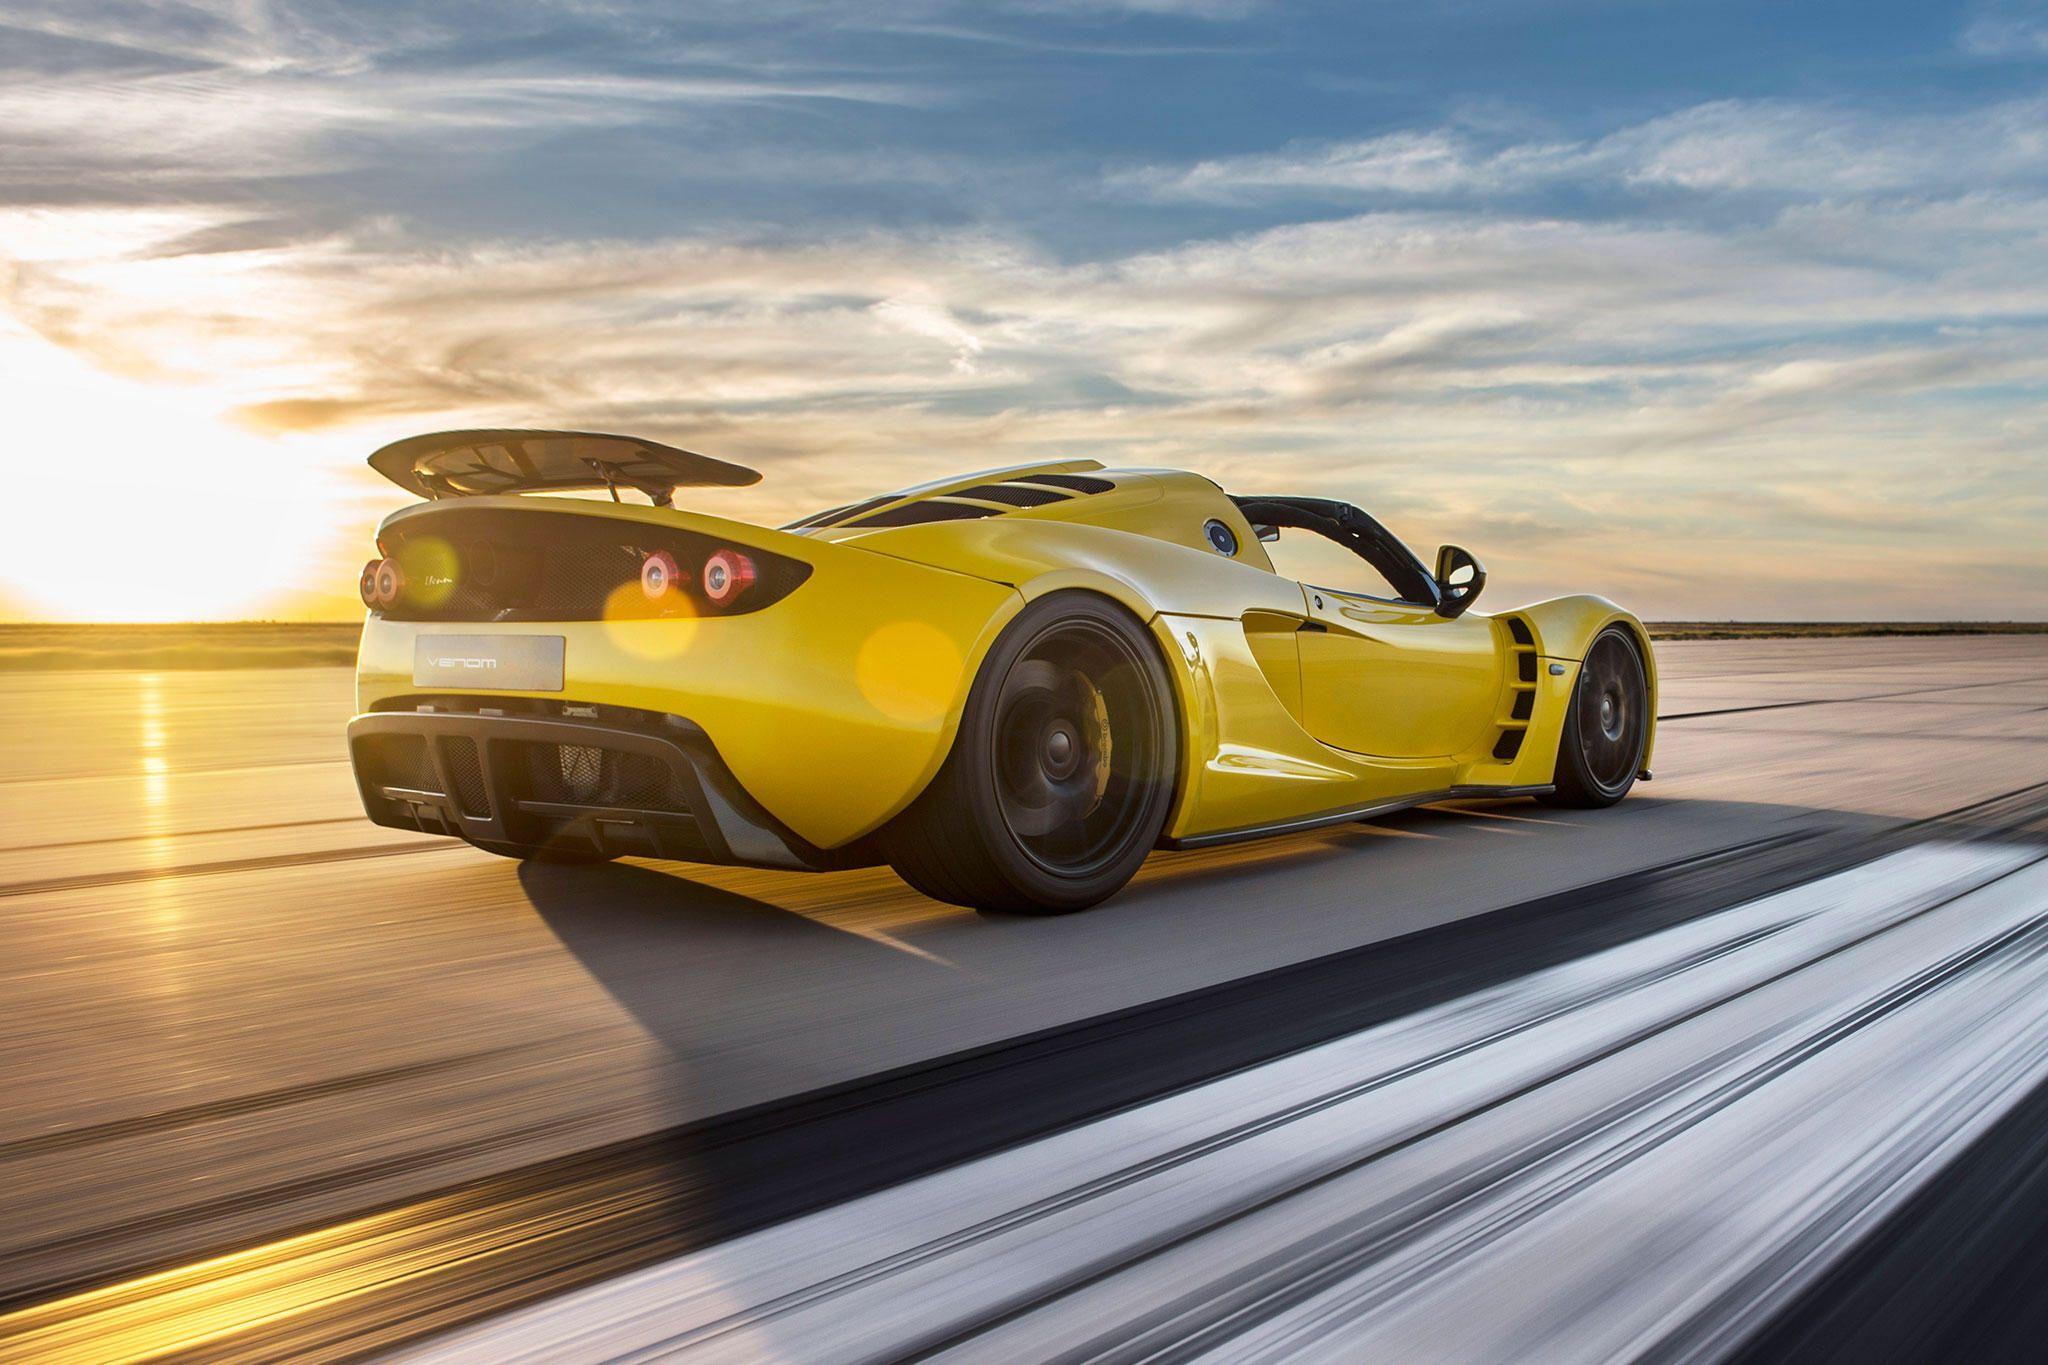 Hennessey Venom Gt Spyder Is The World S Fastest Convertible Hennessey Venom Gt Hennessey Expensive Sports Cars 2014 venom gt world speed record by